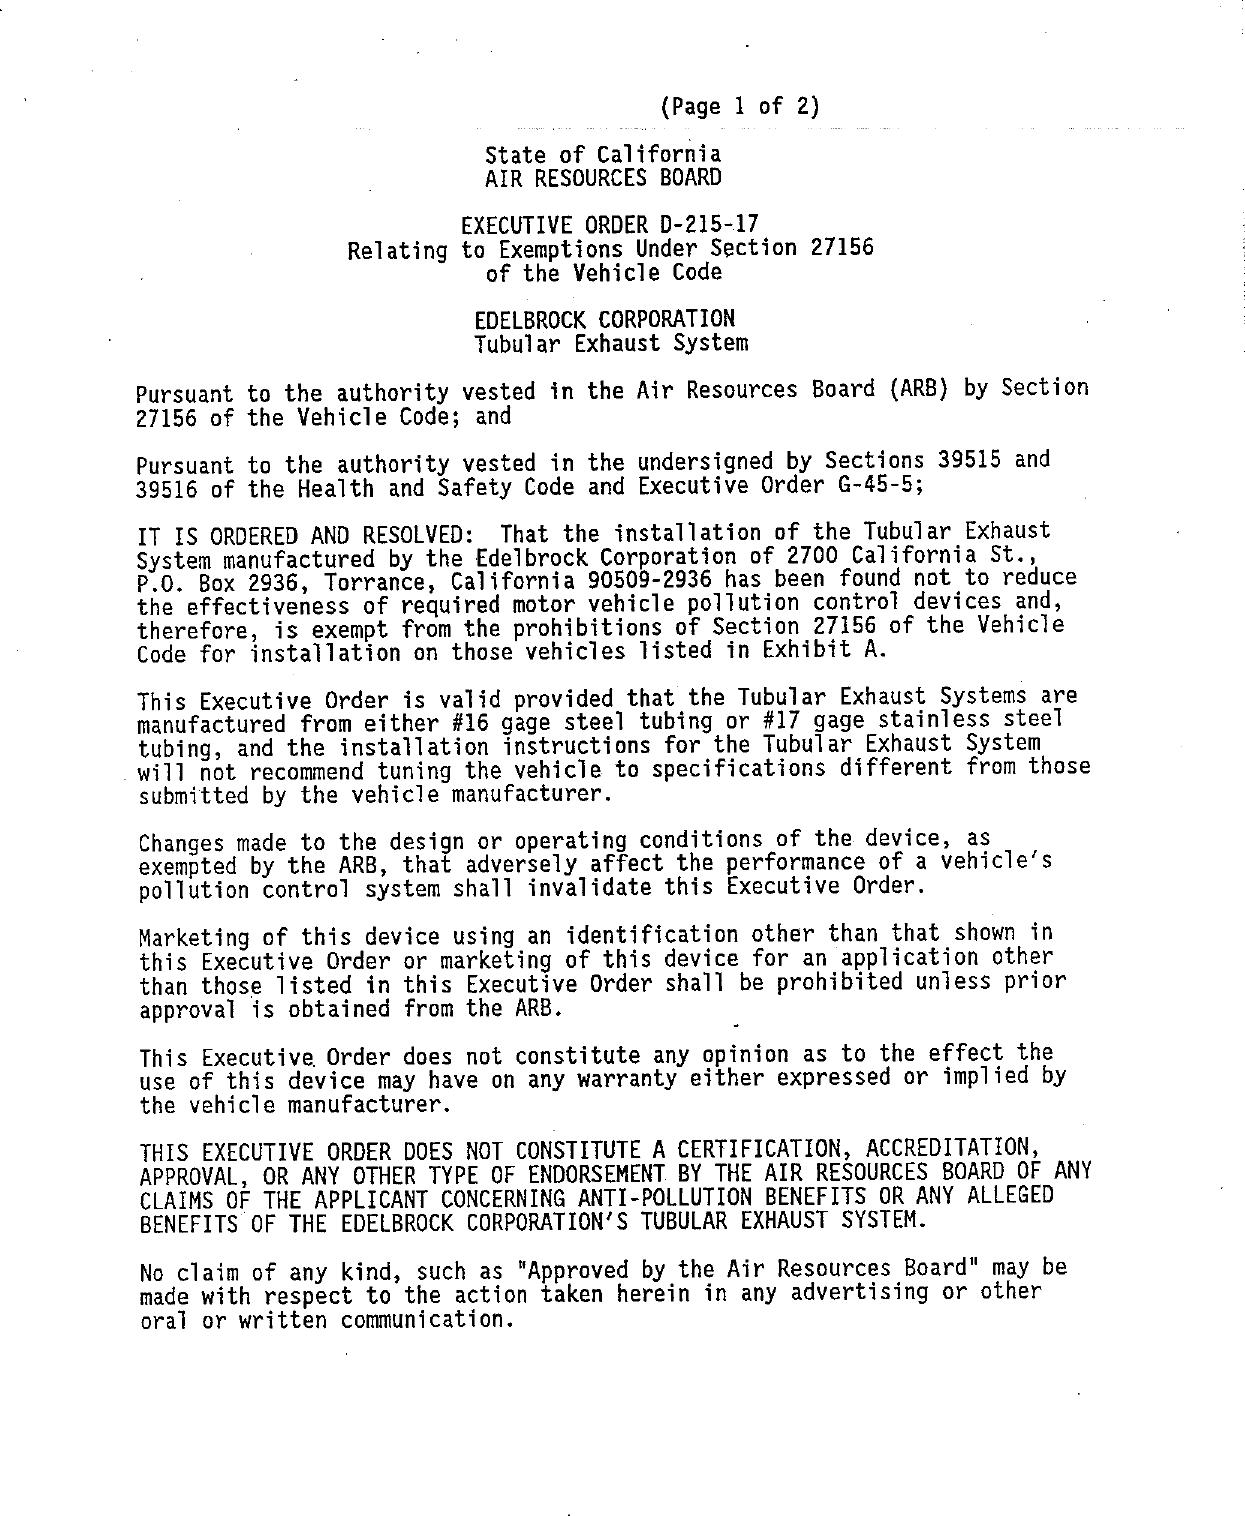 Executive Order D-215-17 Edelbrock